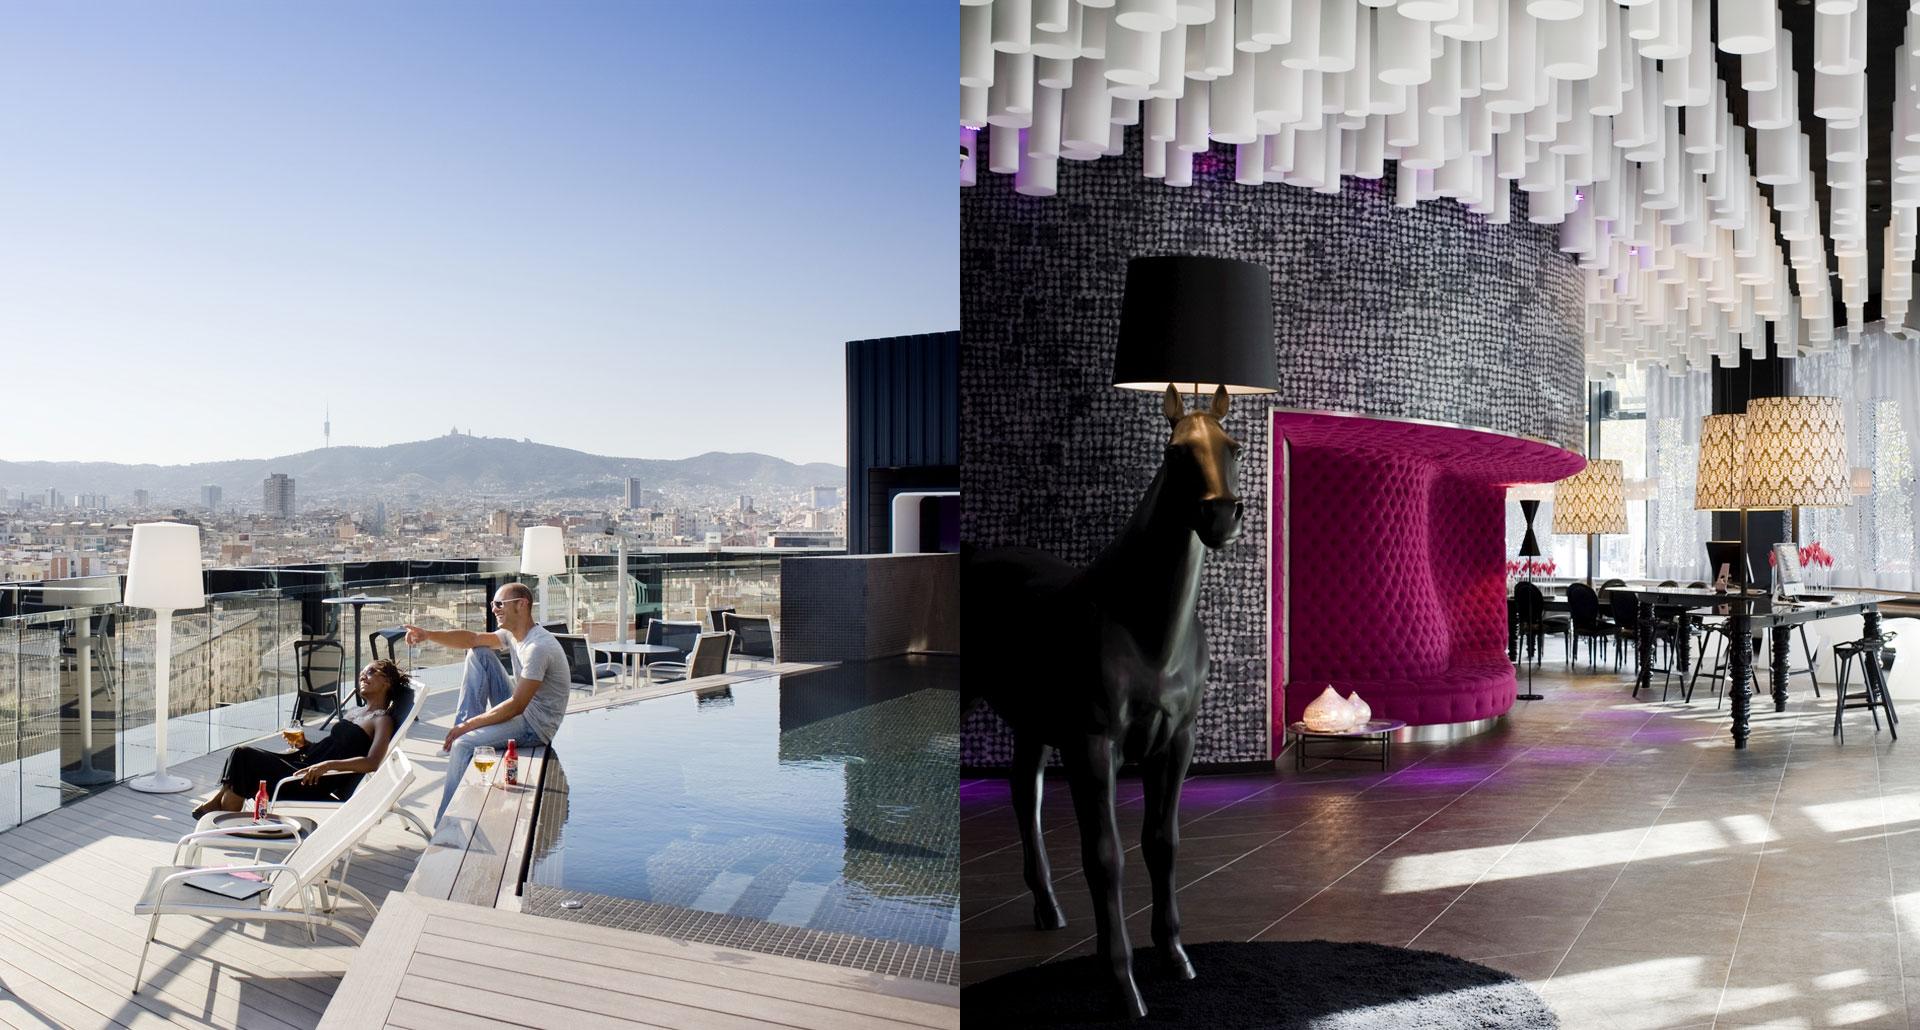 Barcelo Raval - best nightlife boutique hotel in Barcelona